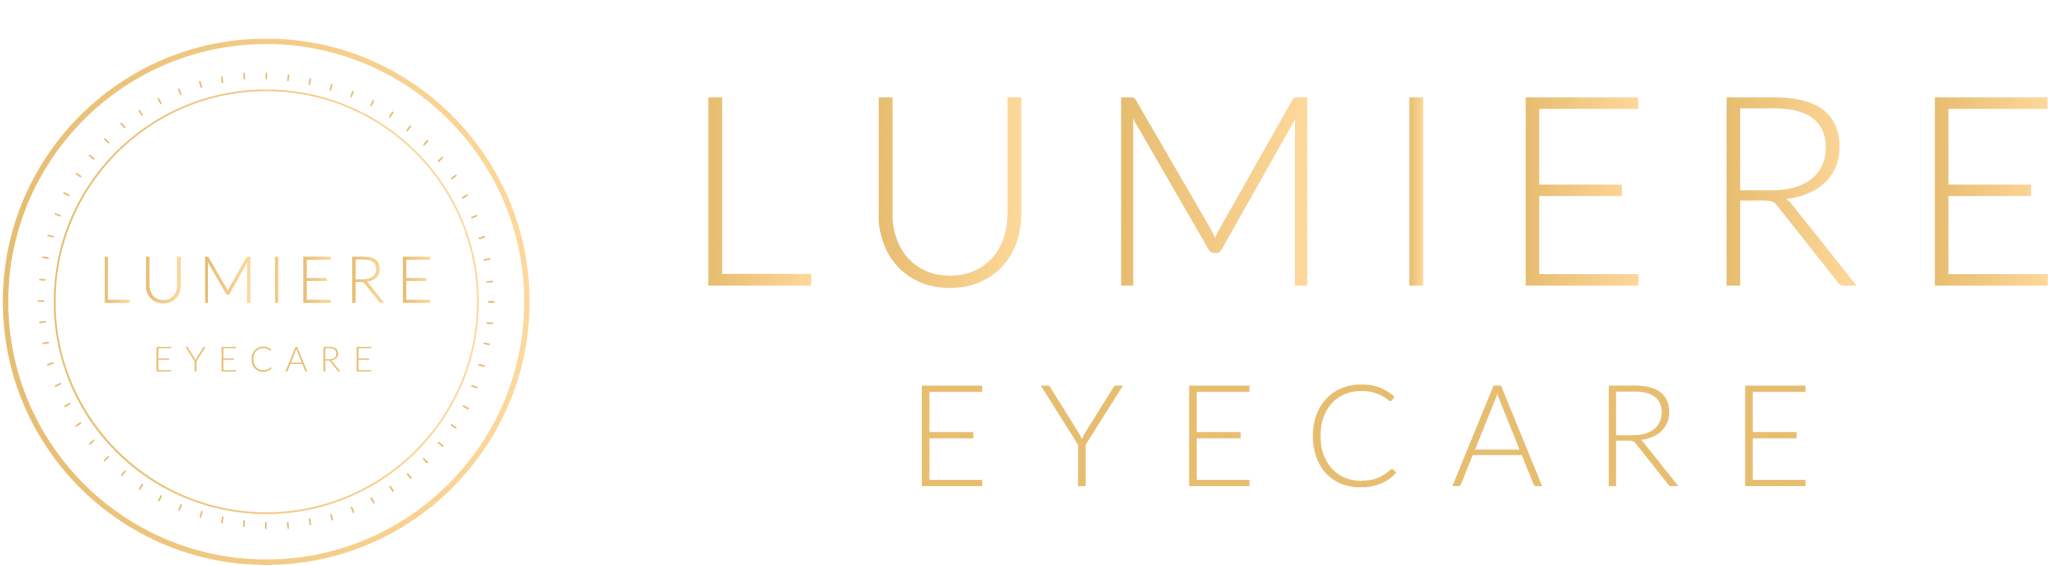 Lumiere Eyecare